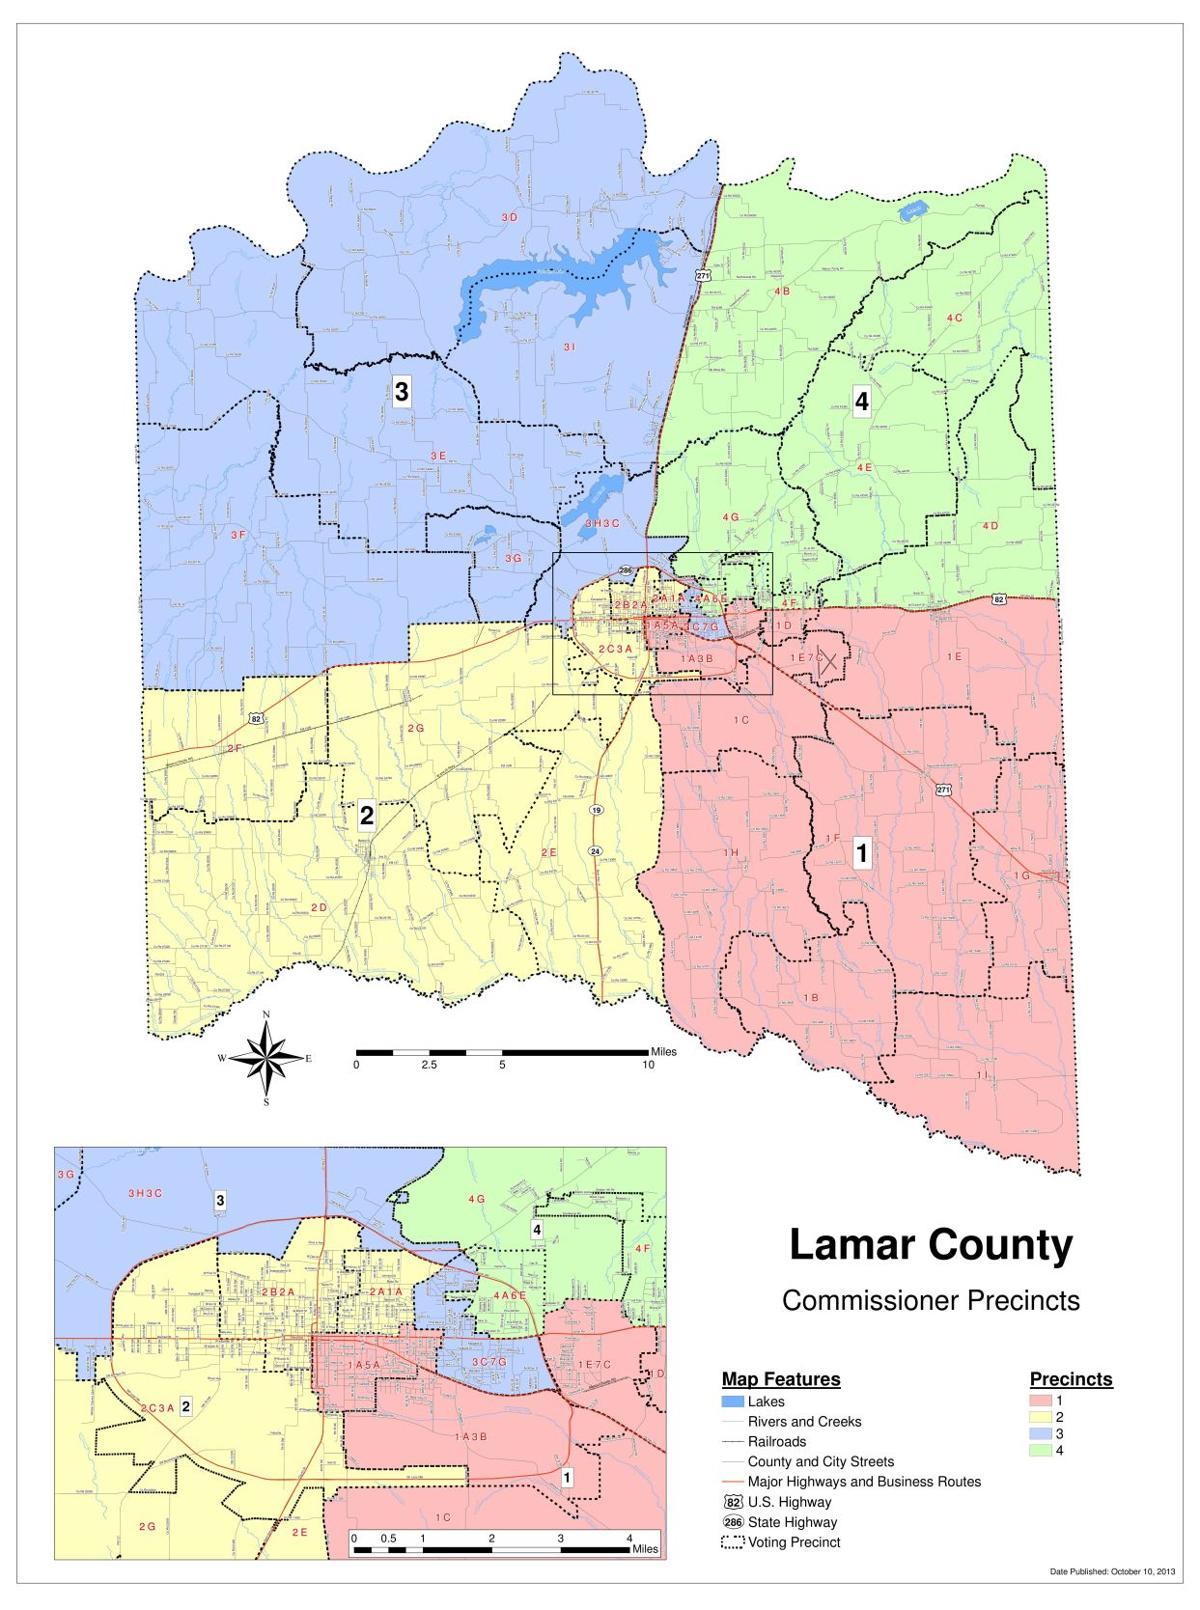 Texas Precincts Map Lamar County Precinct Map | | theparisnews.com